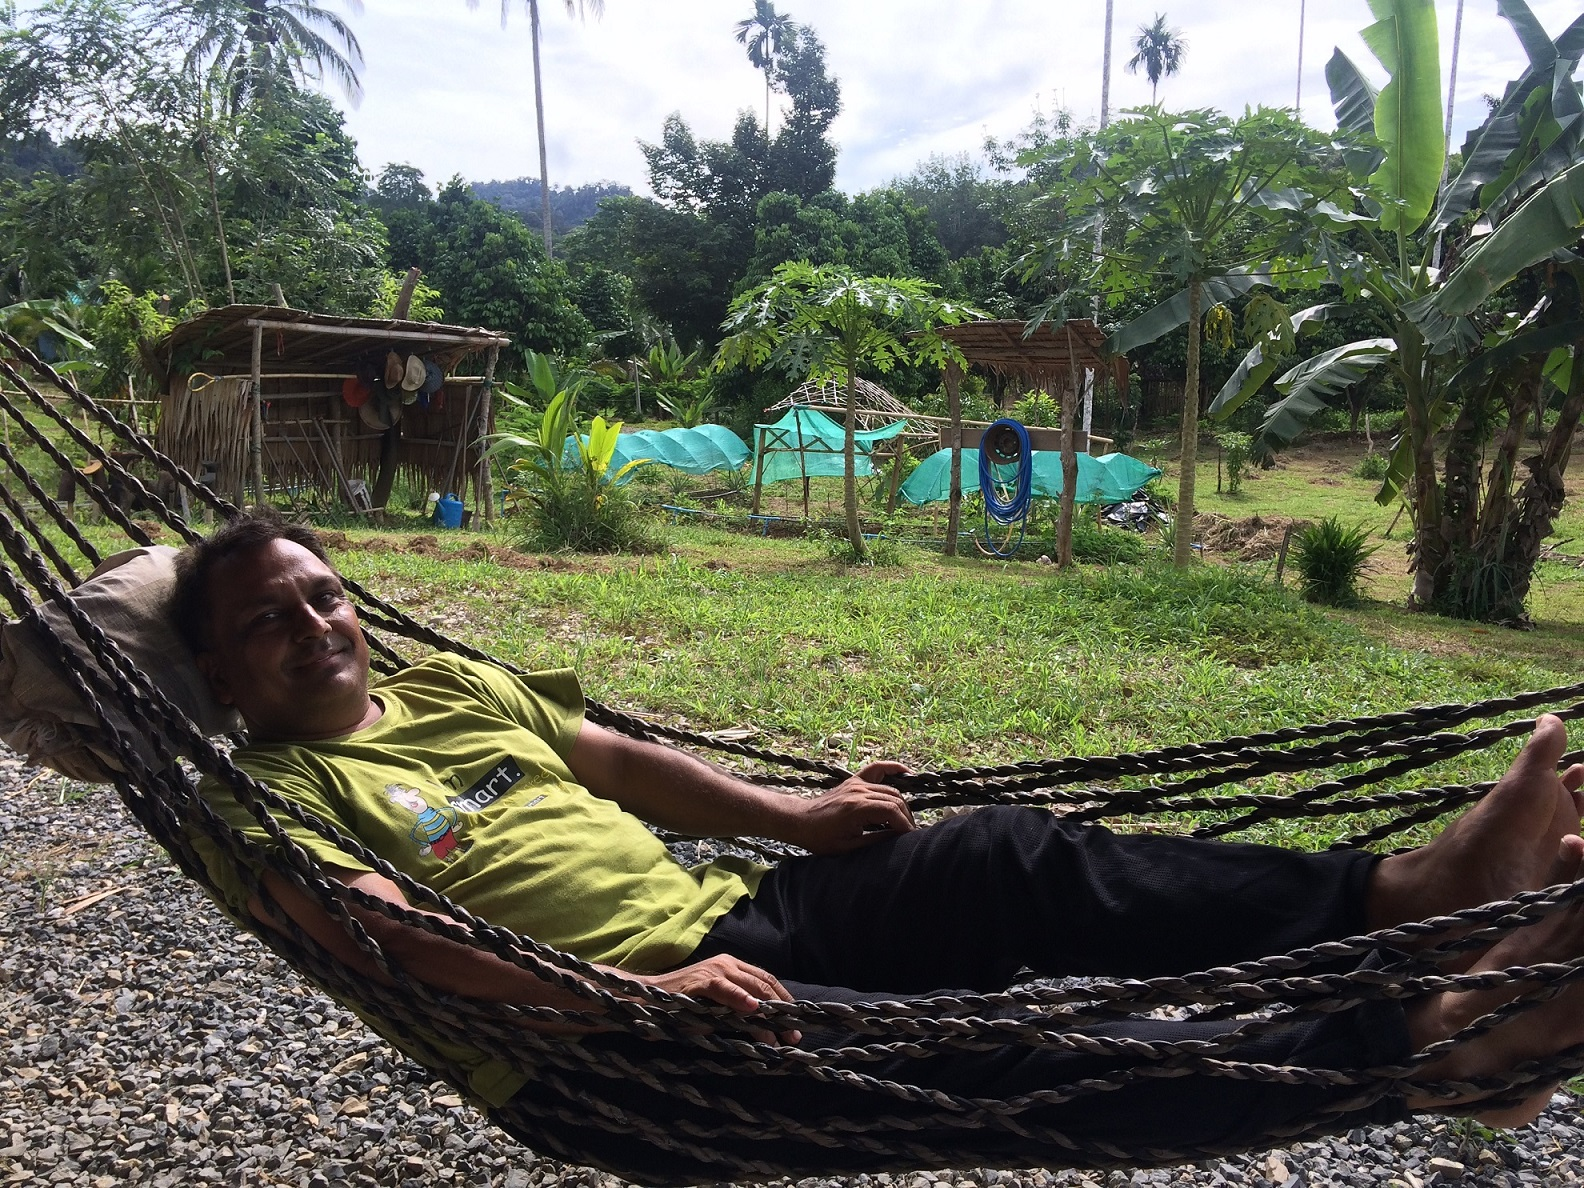 garawe relax